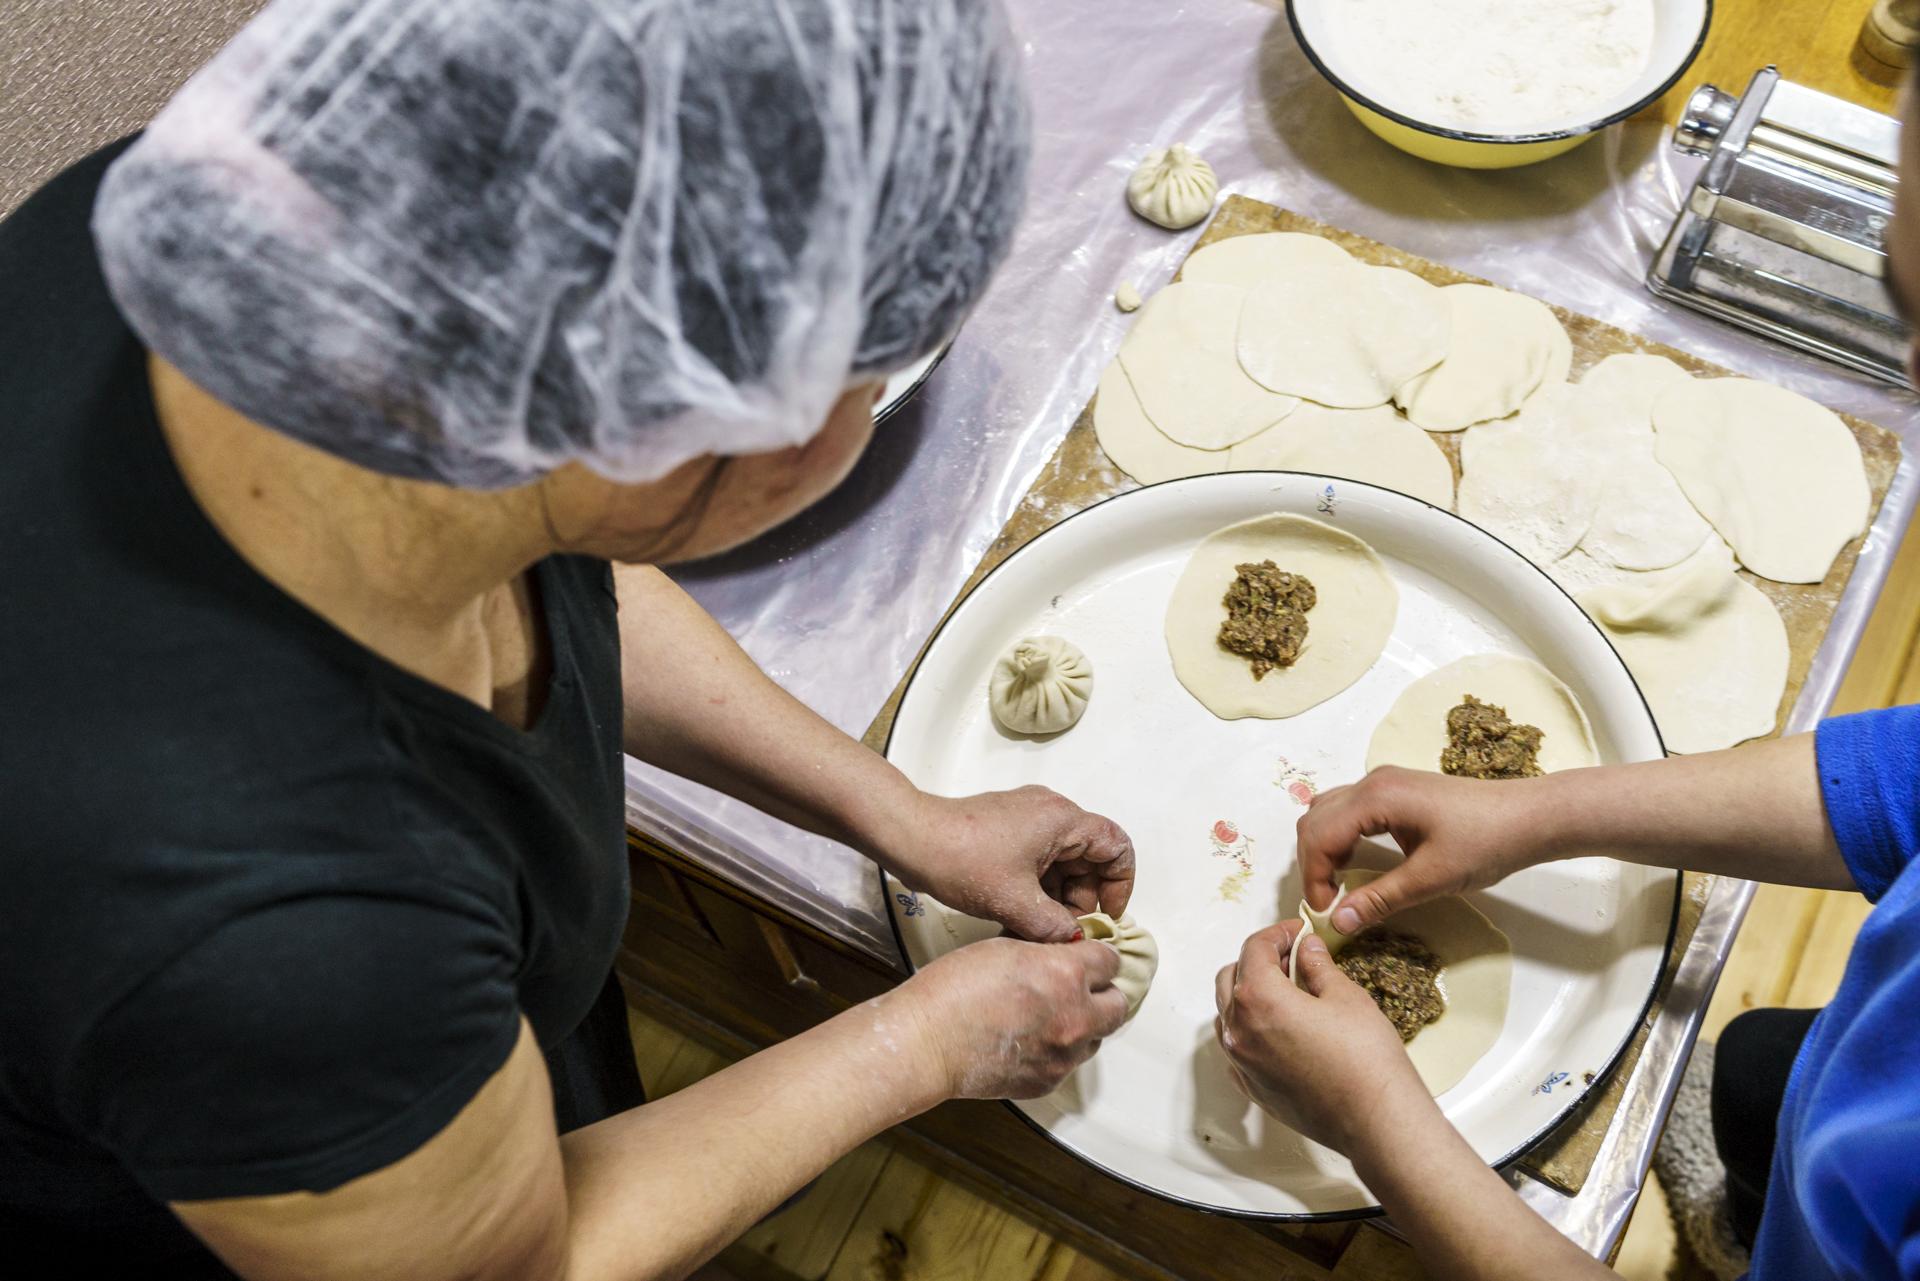 Chinkali Vorbereitung